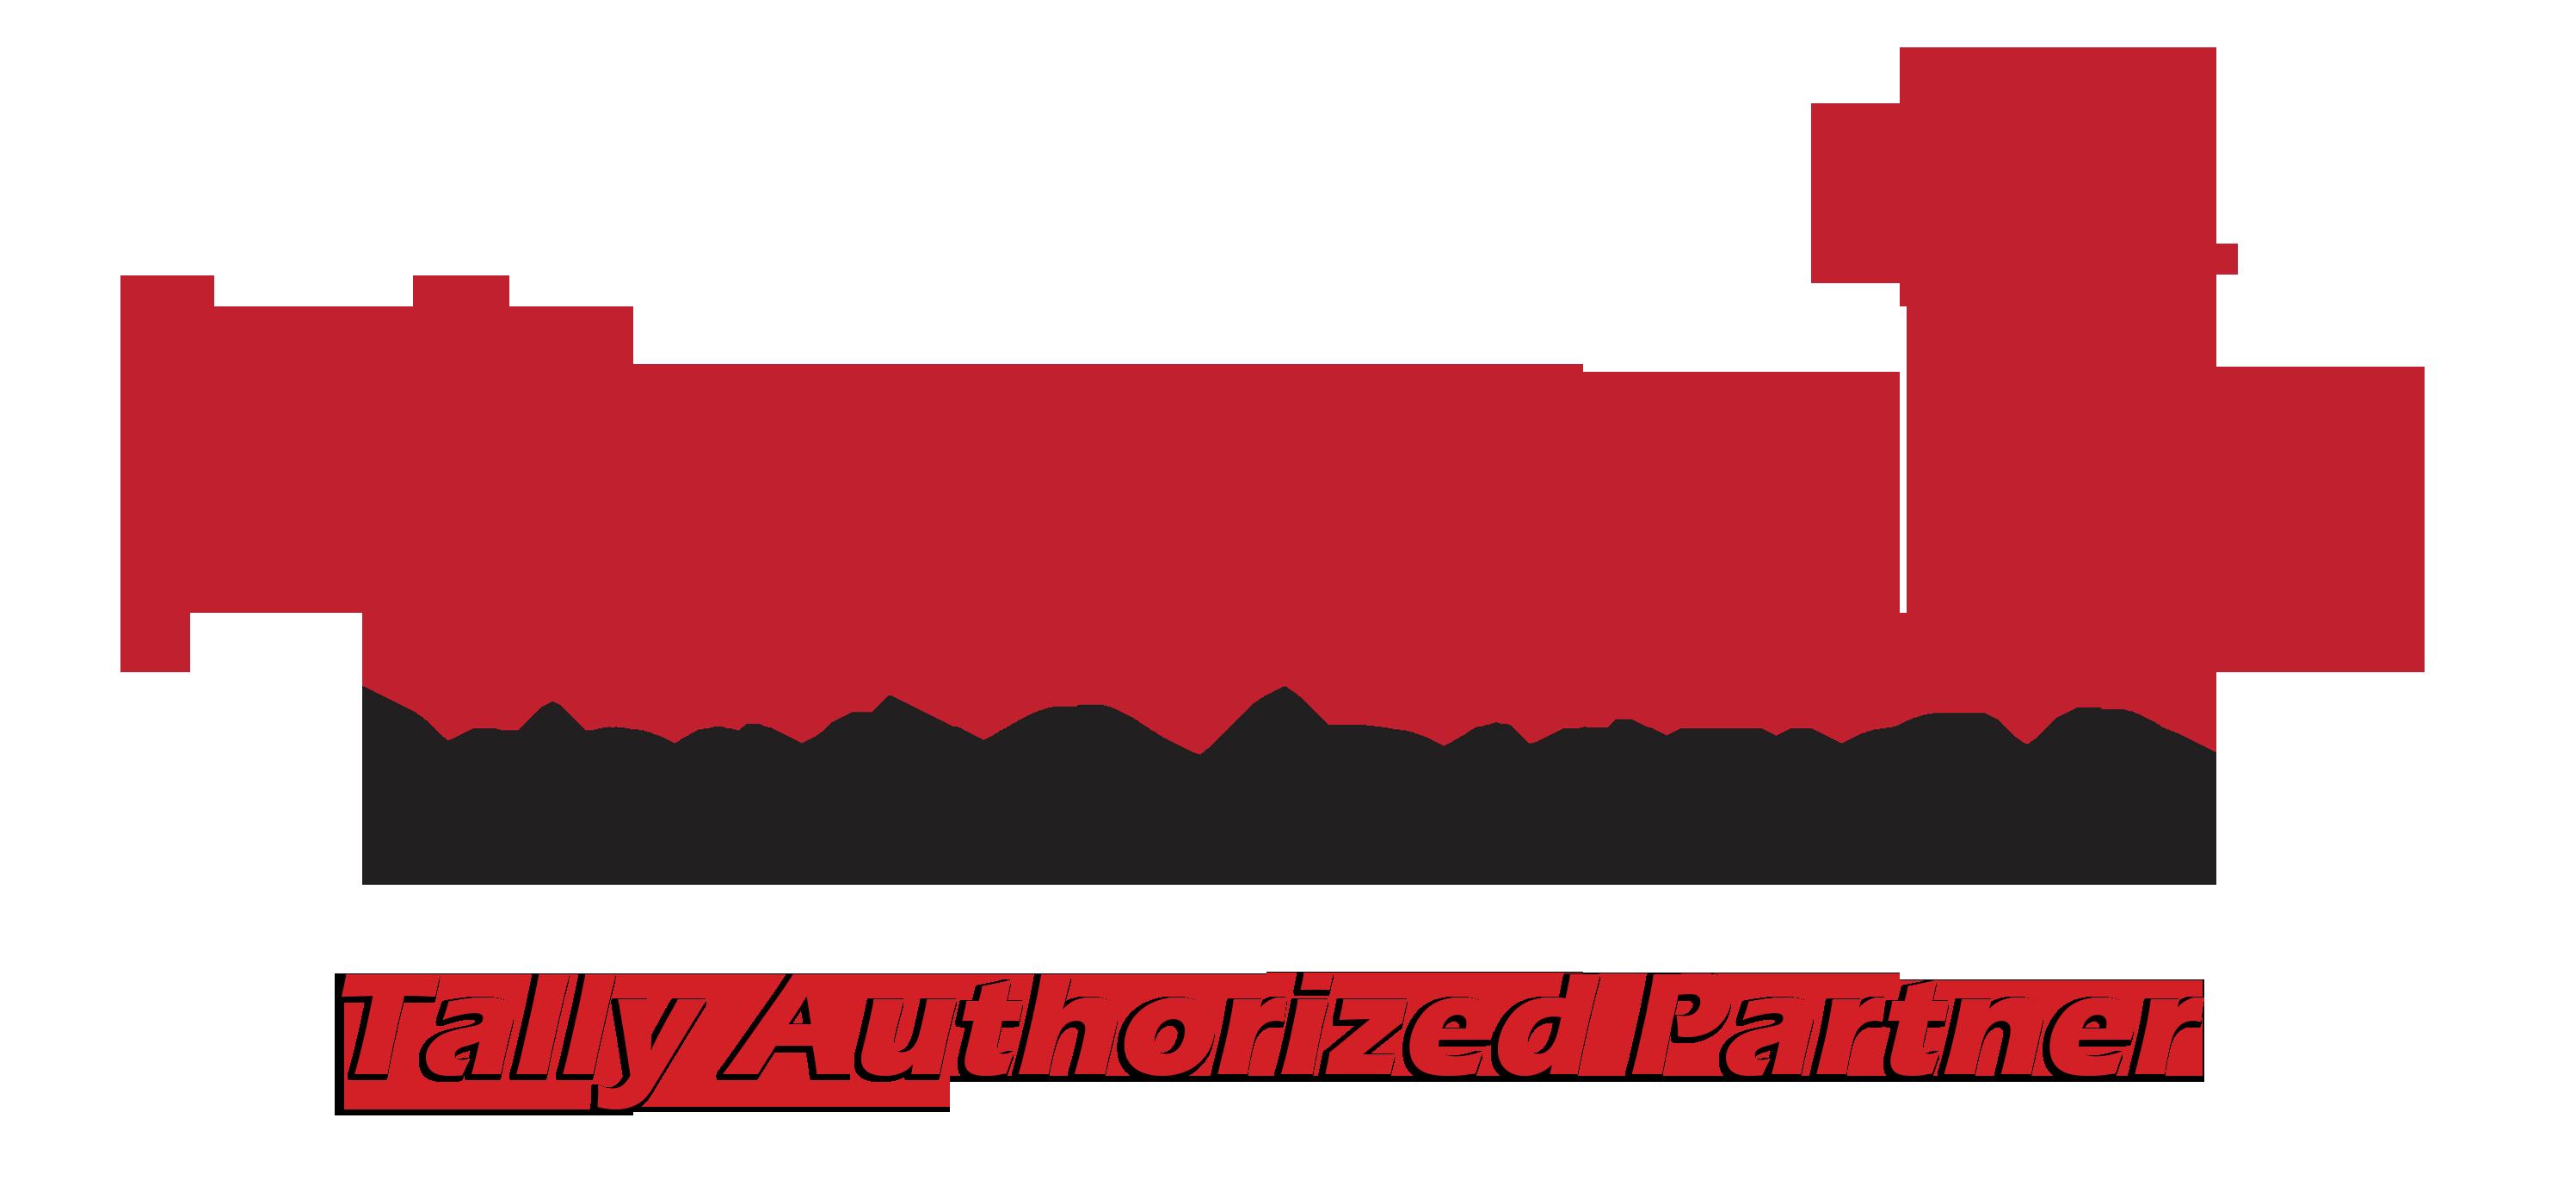 Mawazin Business Solutions - موازين لحلول الأعمال